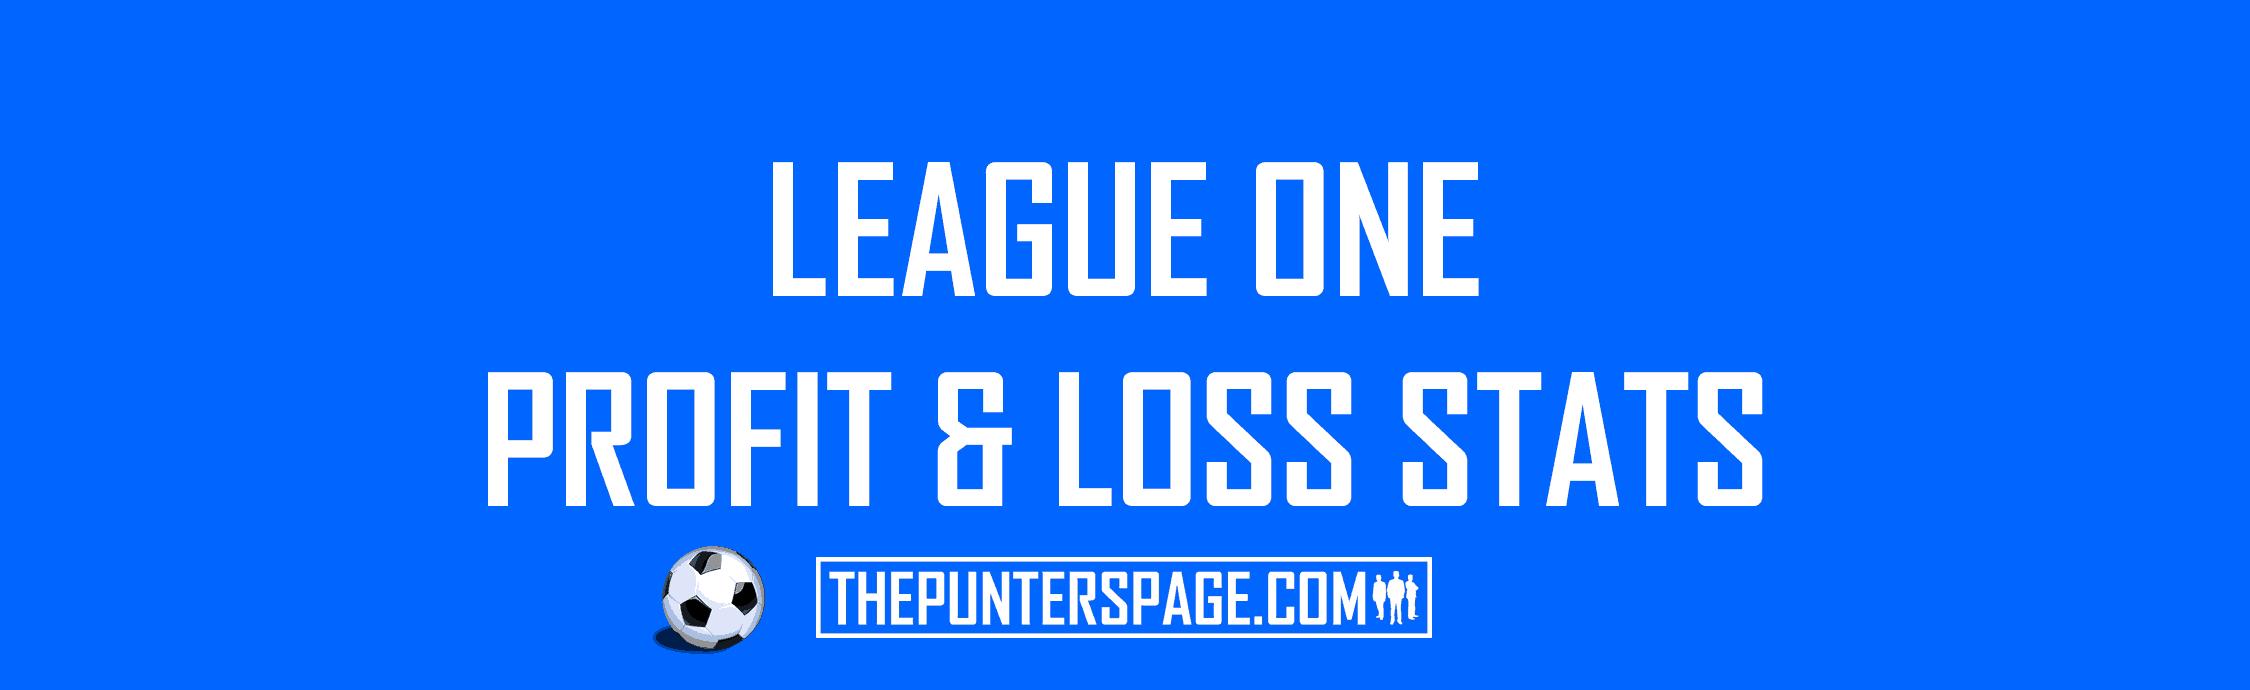 English League One Profit & Loss Statistics